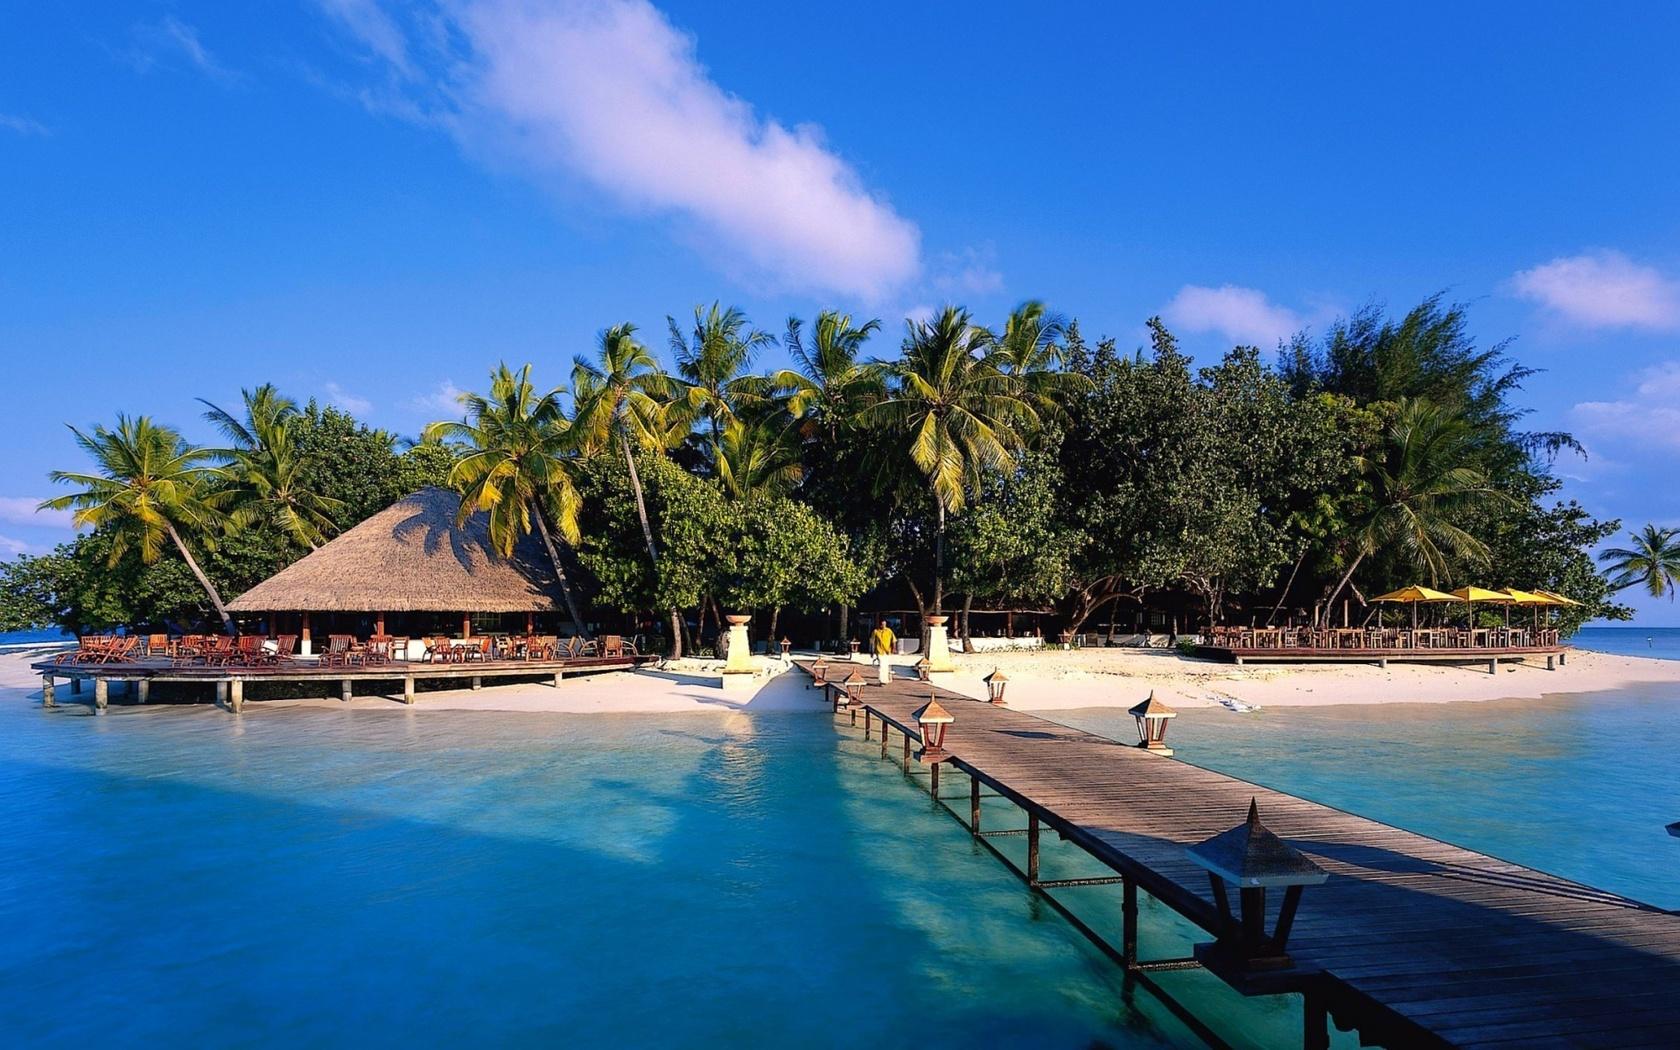 maldives, island, exotic, ocean, water, palm